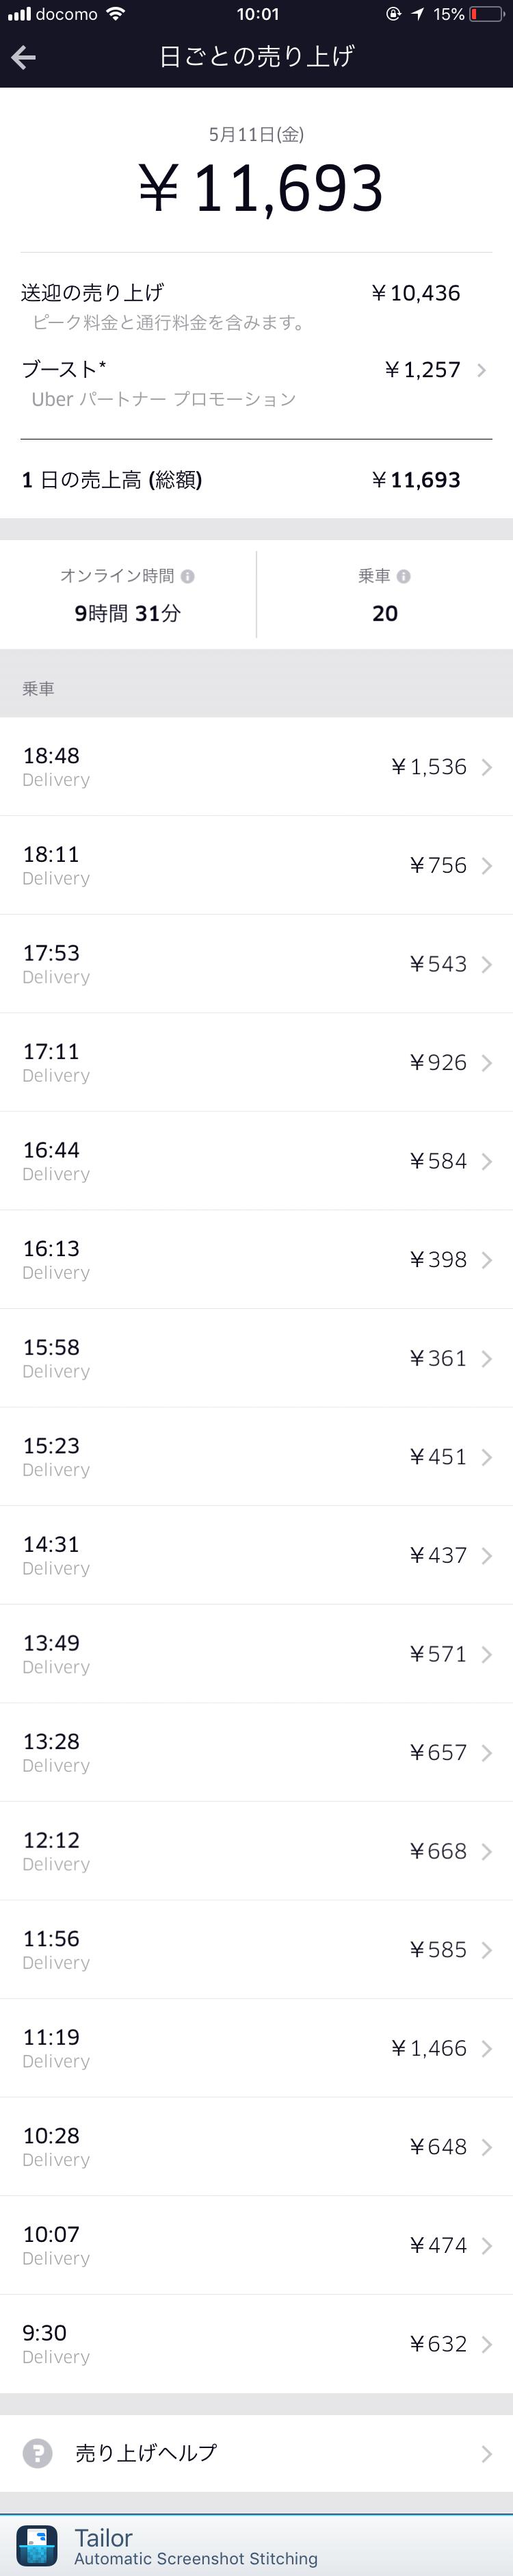 Uber Eats5月11日の配達記録